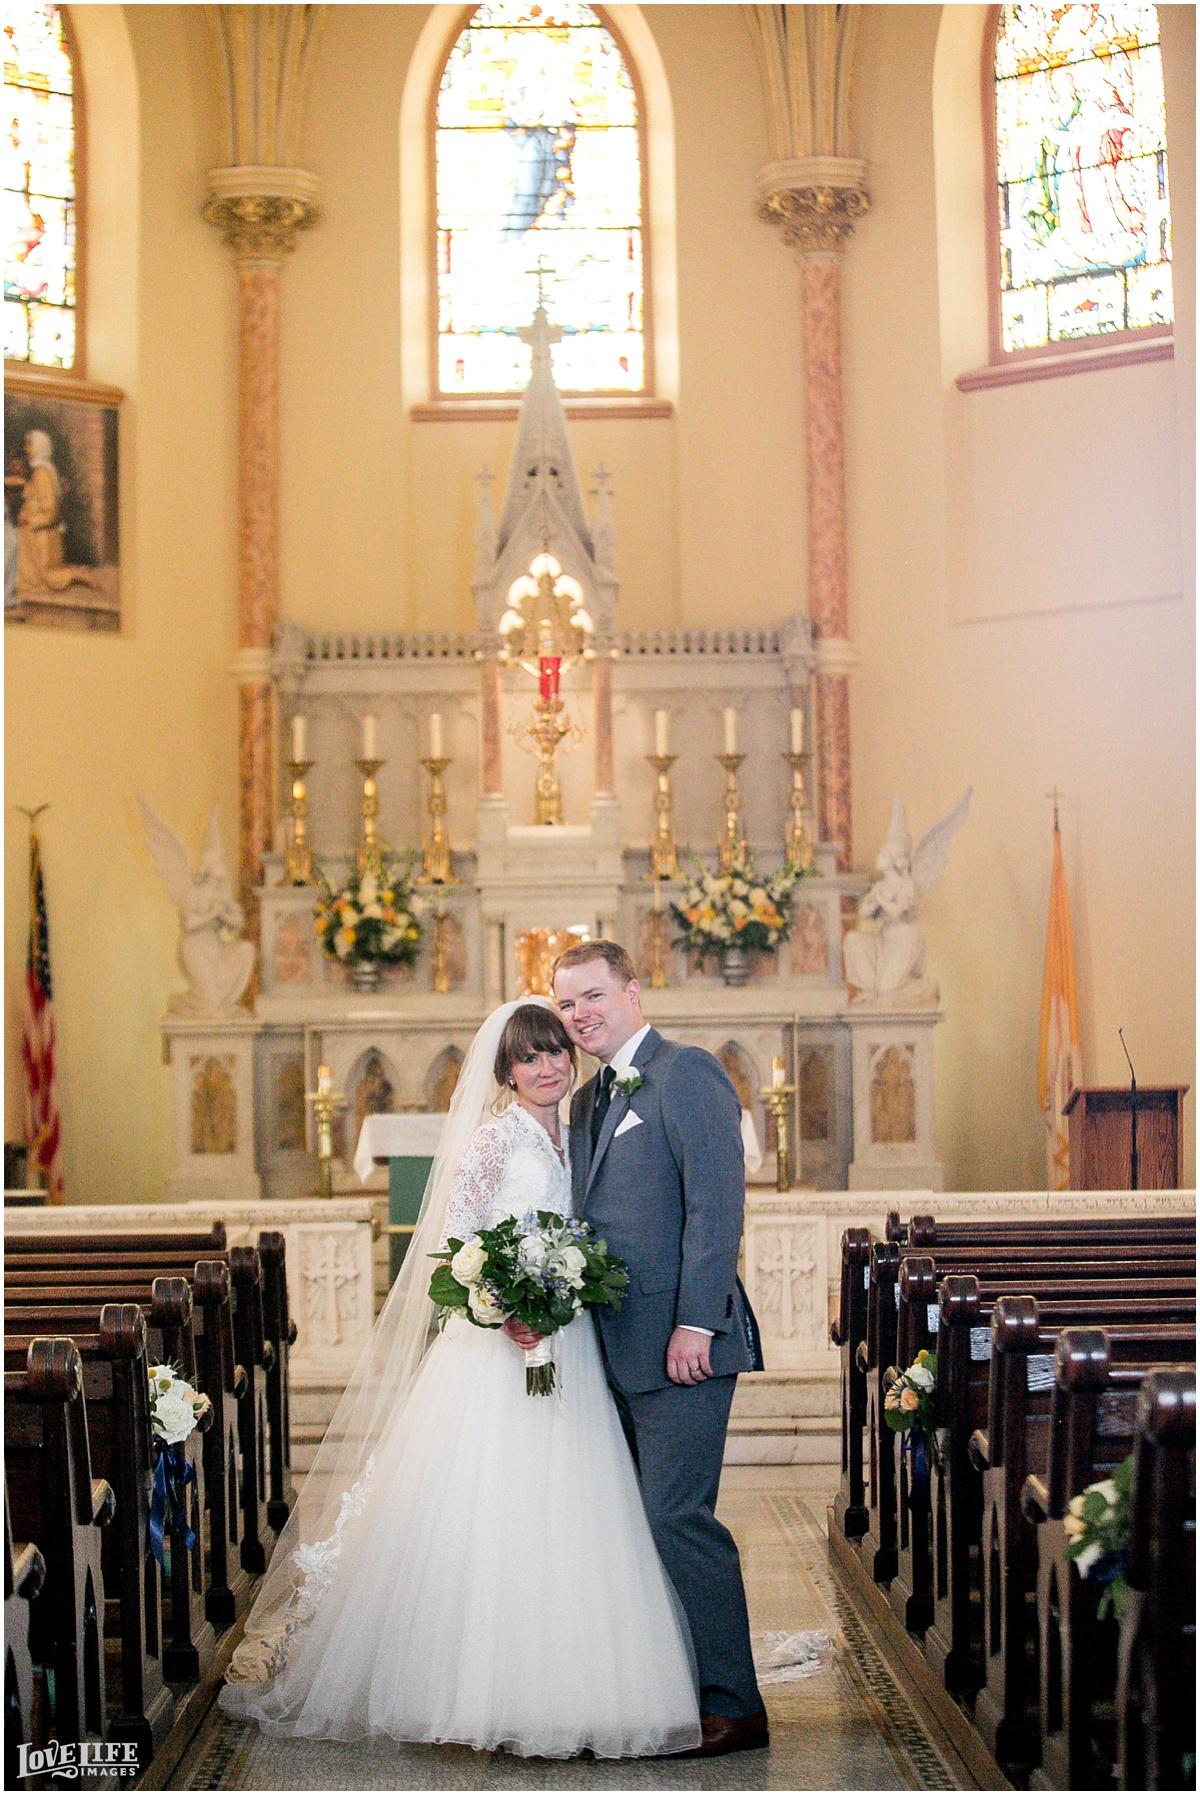 Dumbarton House DC Wedding bridal portrait in church.jpg